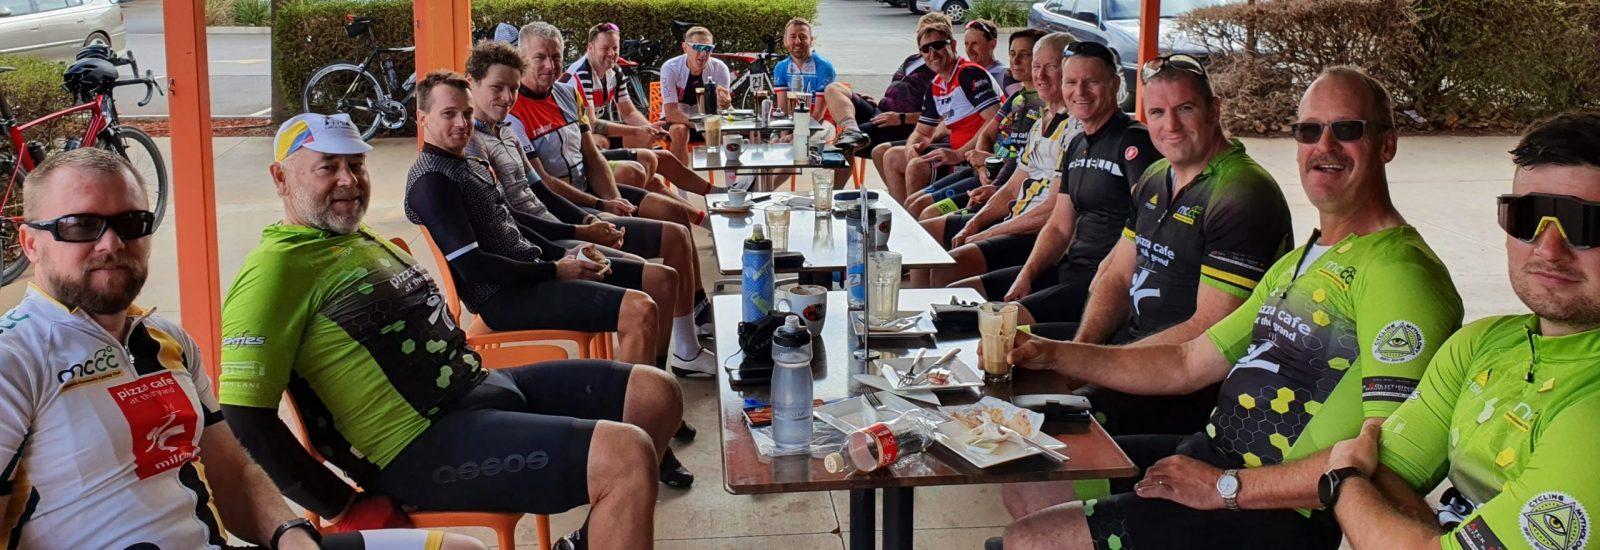 Mildura-Coomealla Cycling Club